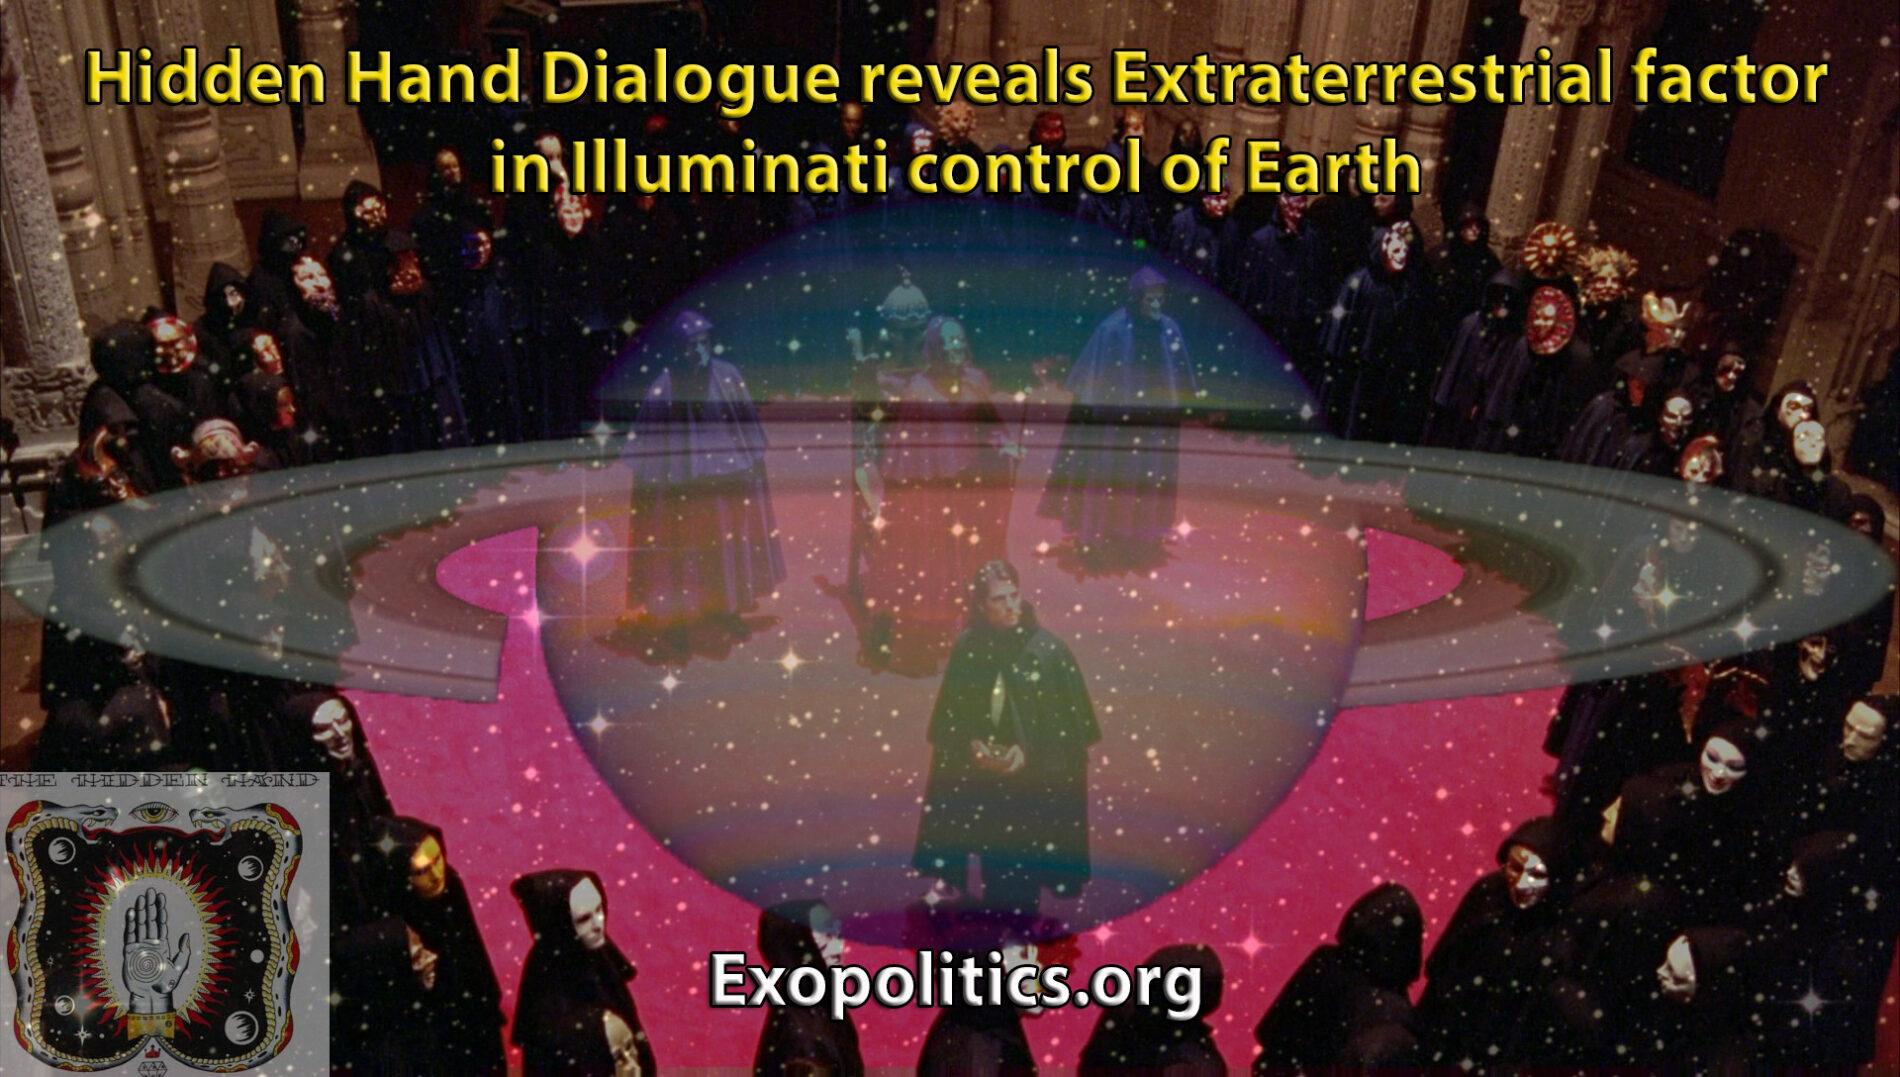 https://i1.wp.com/exopolitics.org/wp-content/uploads/2016/04/Hidden-Hand-Illuminati-Family-1.jpg